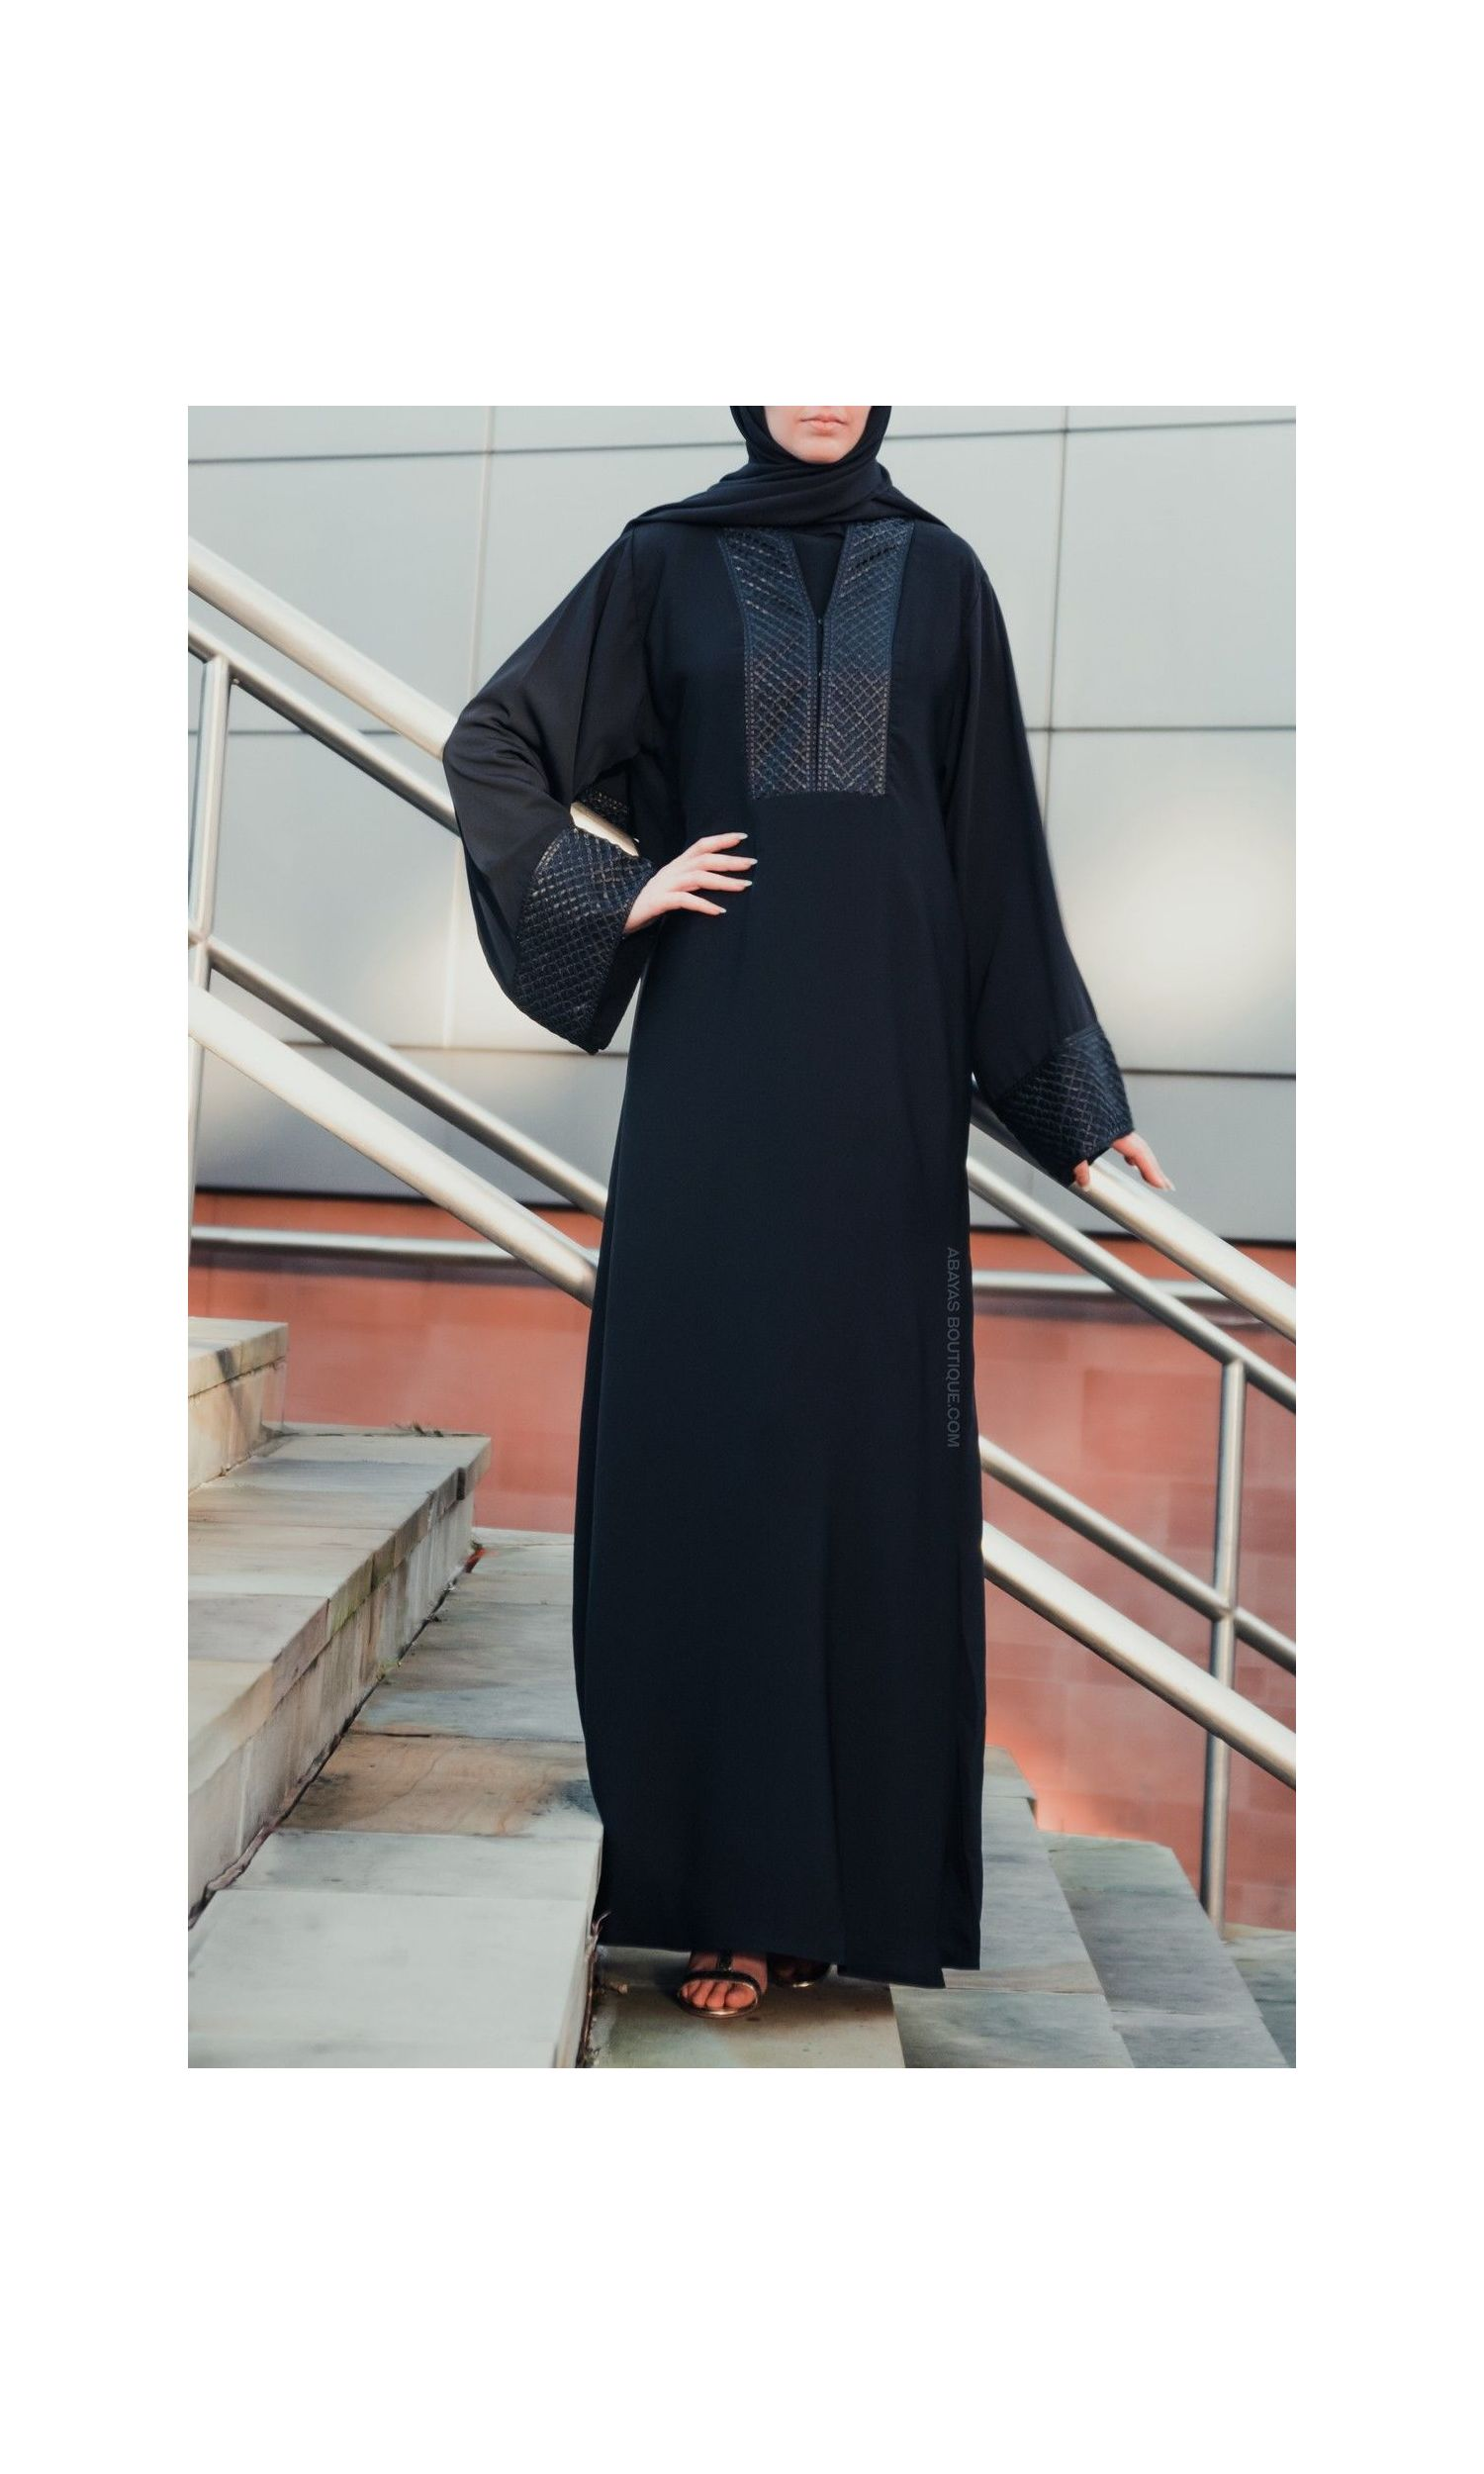 Regal Black & Gold Abaya